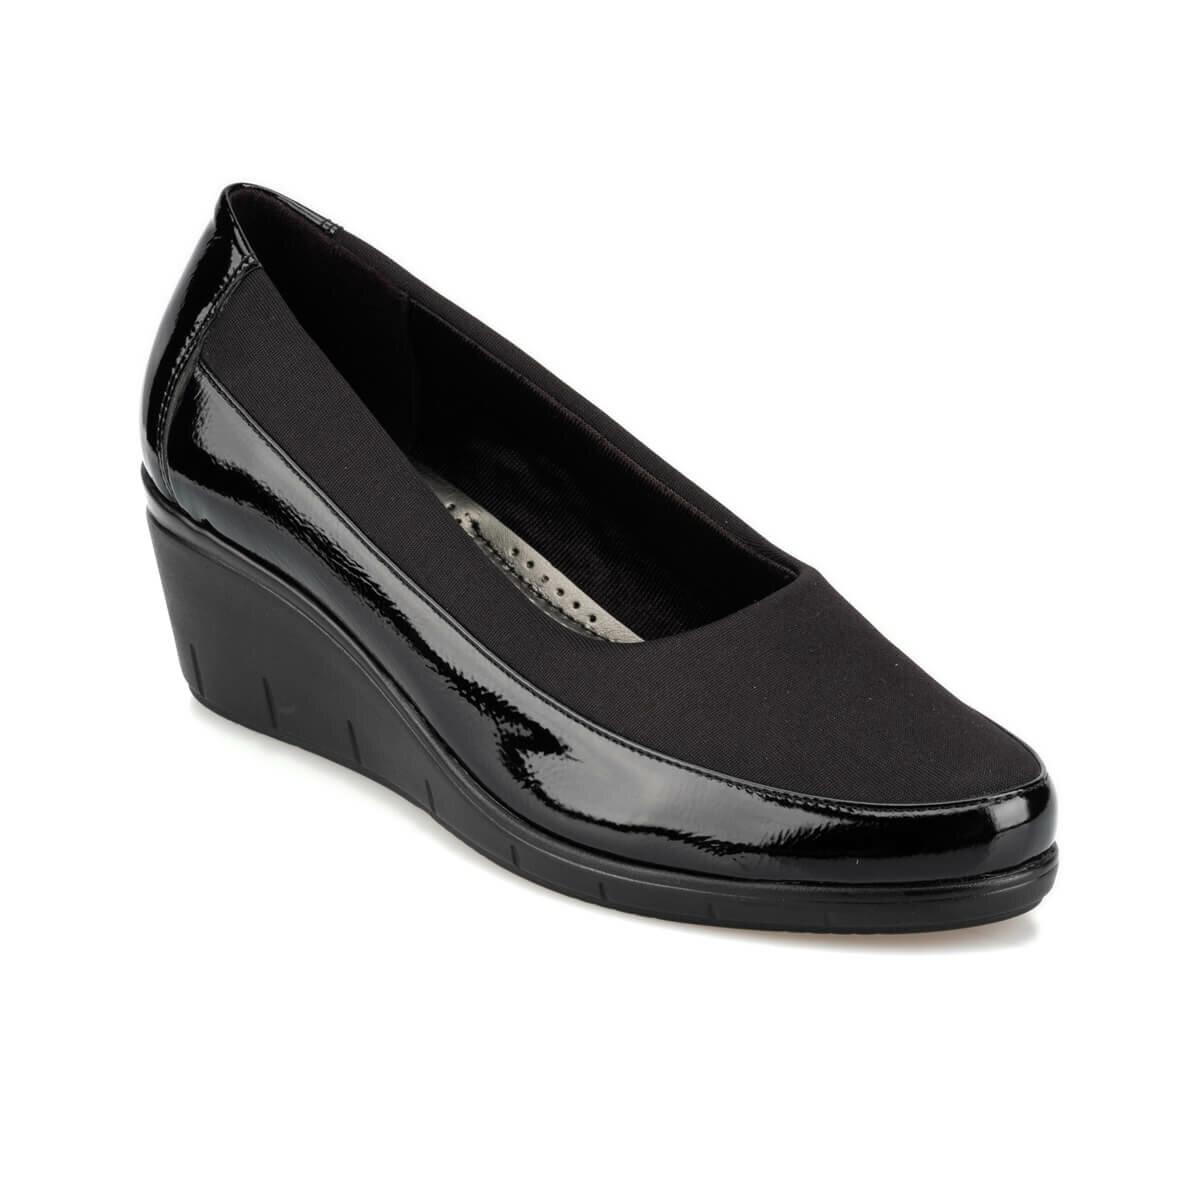 FLO 92.151043RZ Black Women 'S Wedges Shoes Polaris